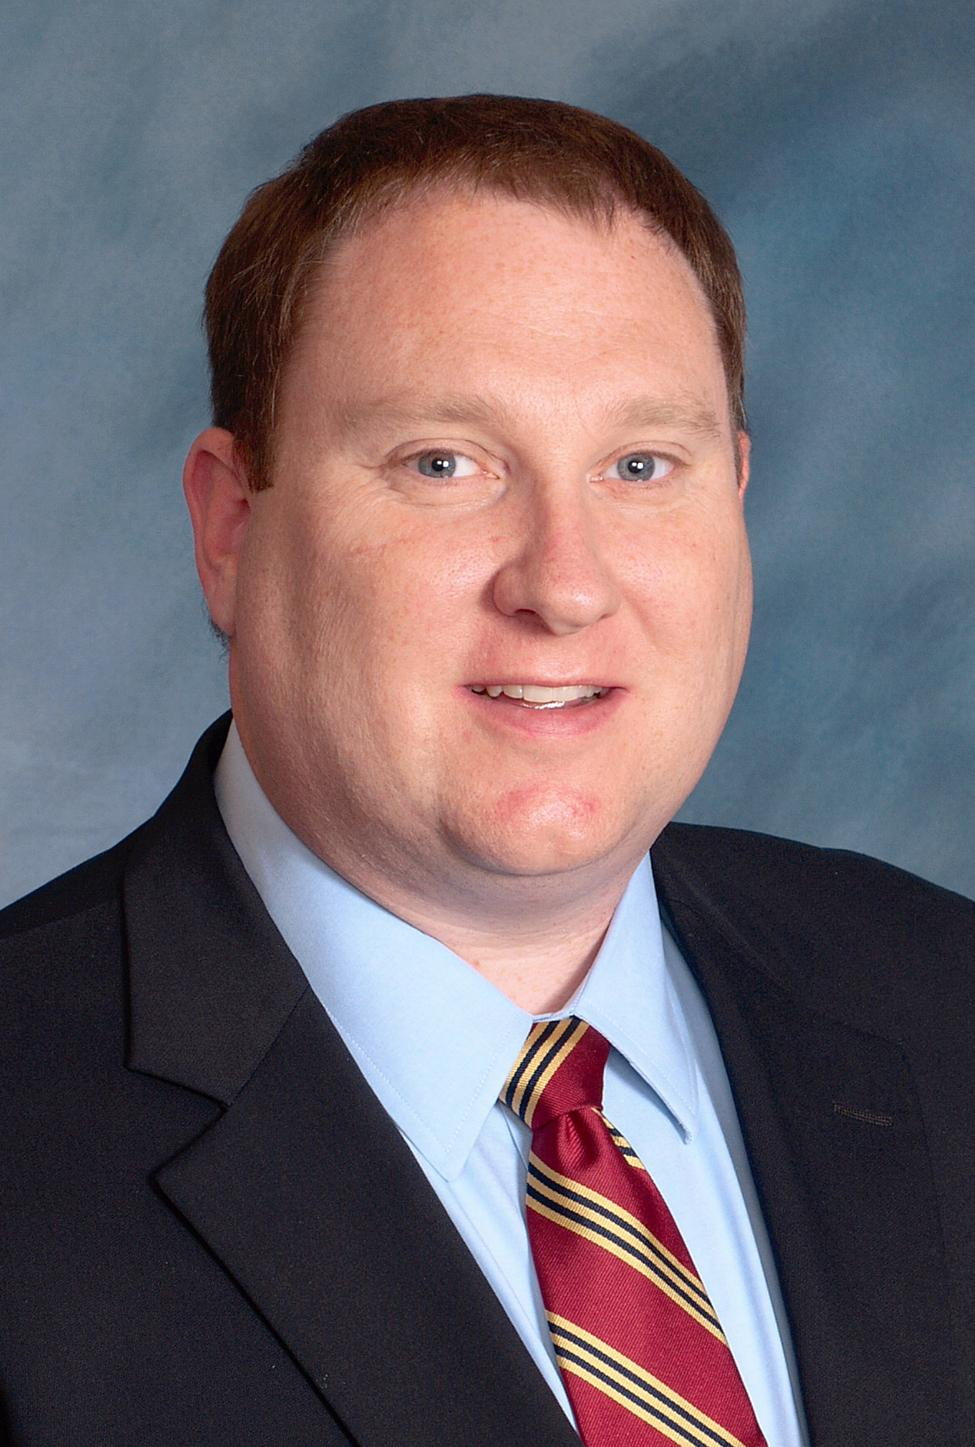 JAMES SUTTON  Your Registered Representative & Insurance Agent